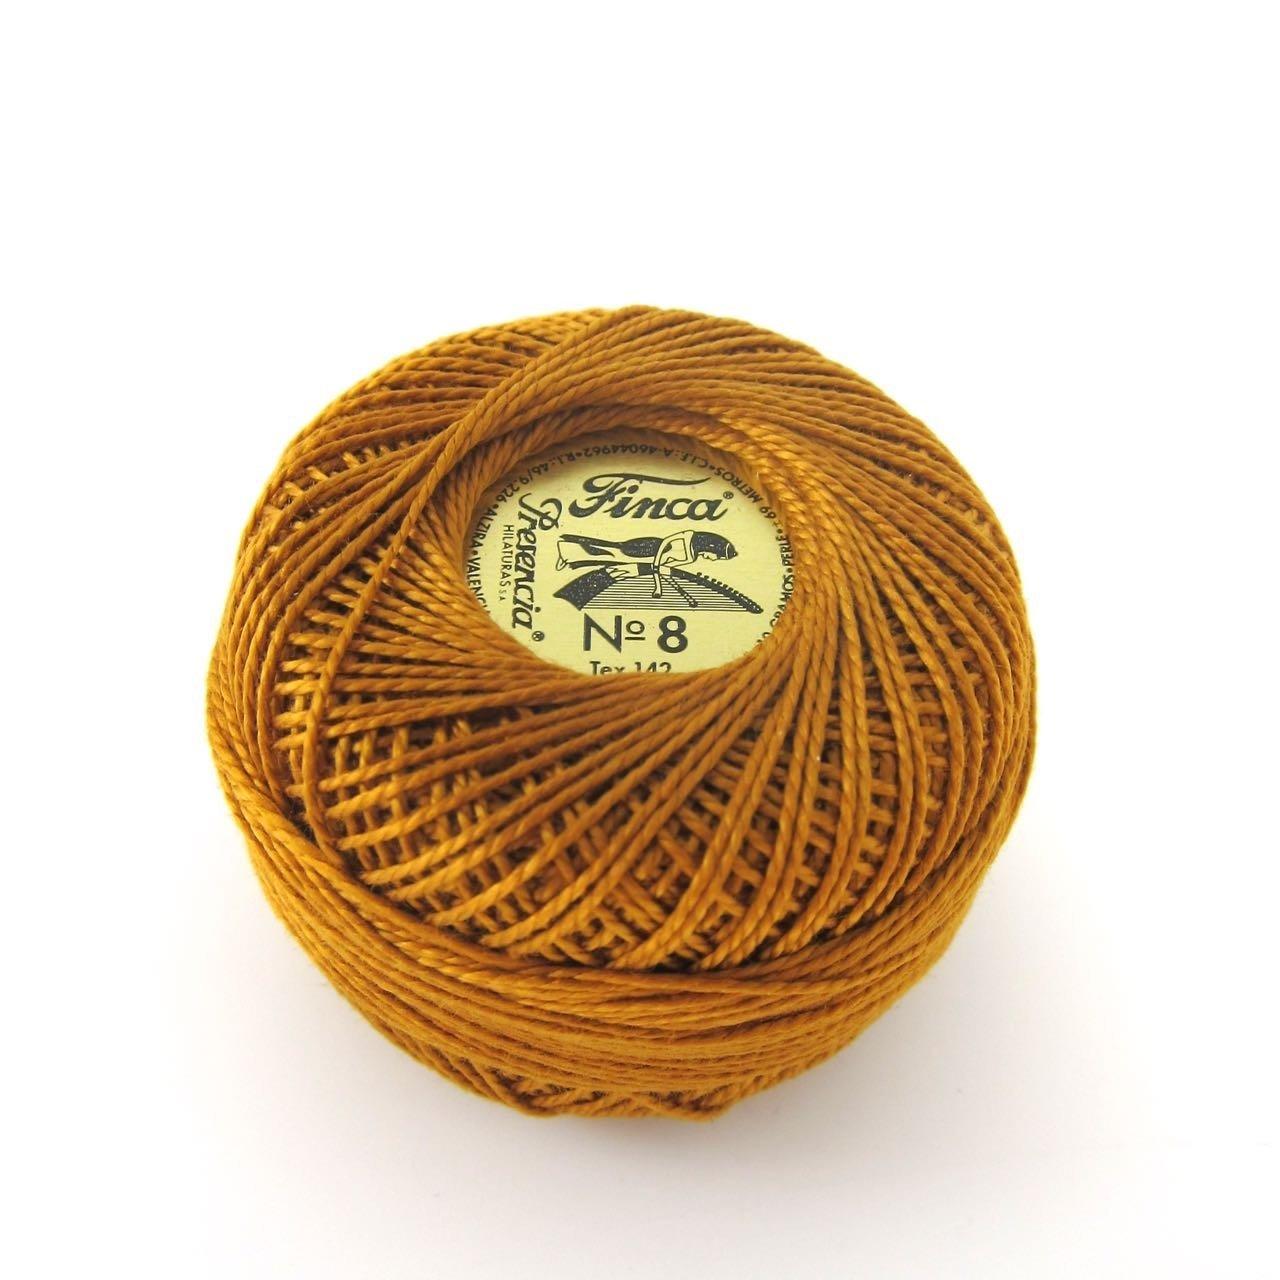 Finca Perle Cotton  Sz 8 - #1072 Golden Brown